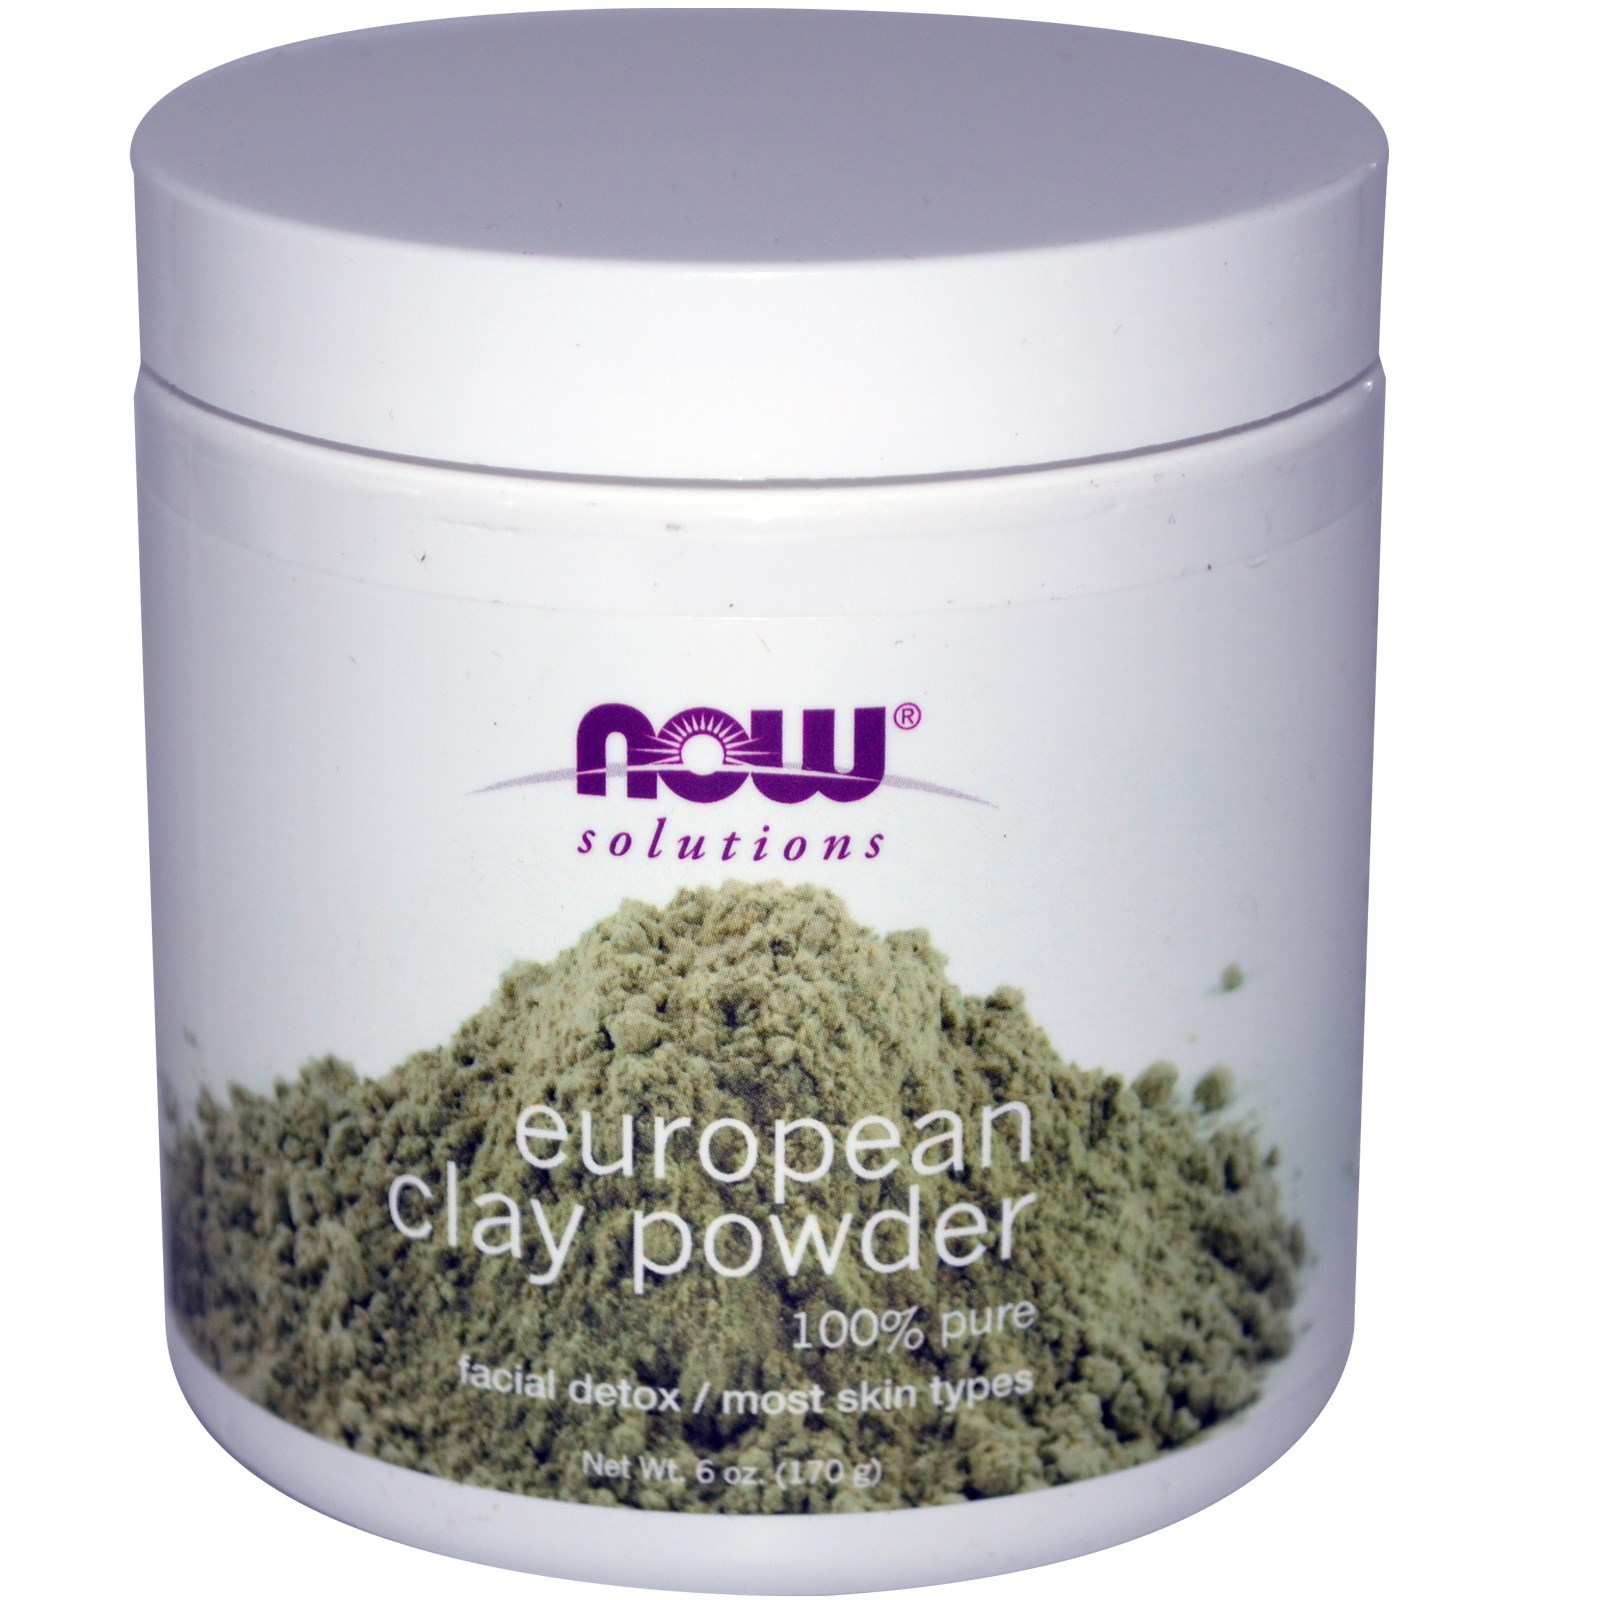 Image of European Clay Powder (170 gram) - Now Foods 0733739081506